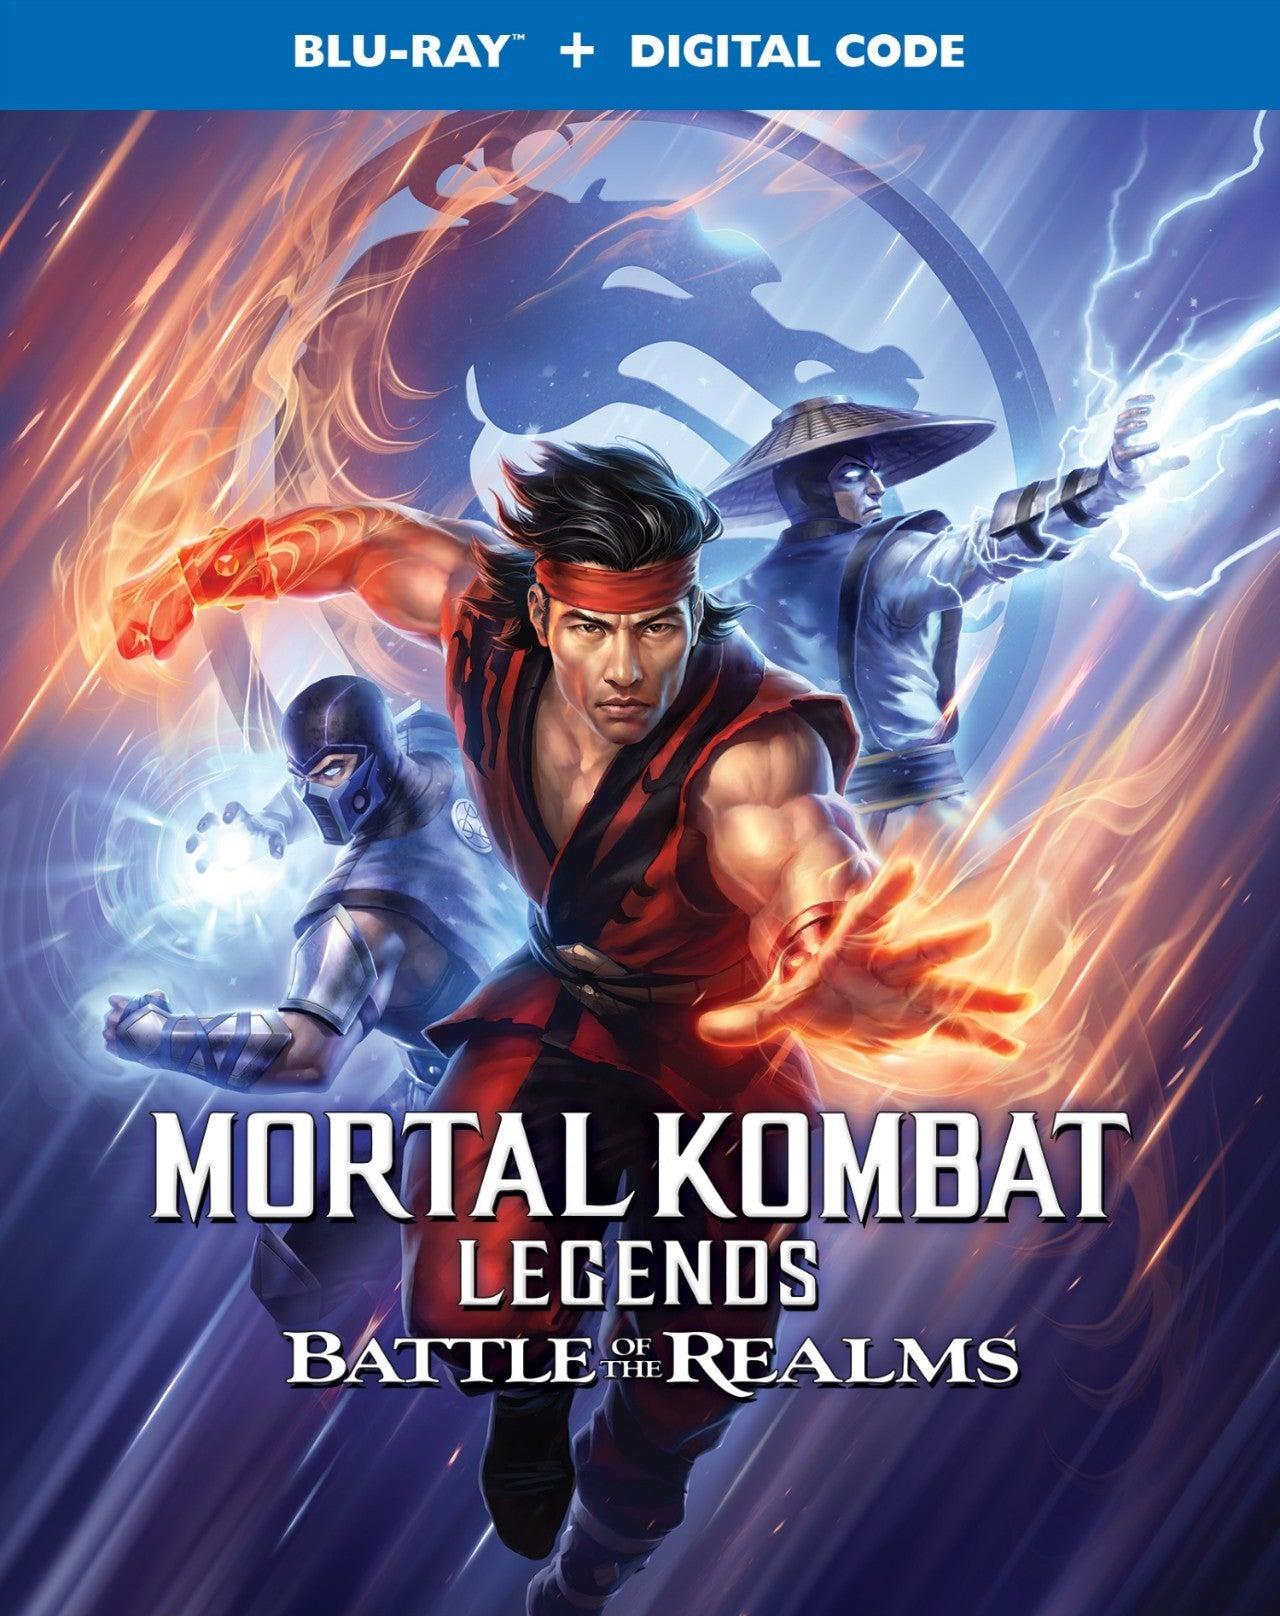 mortal kombat legends battle of the realms box art full